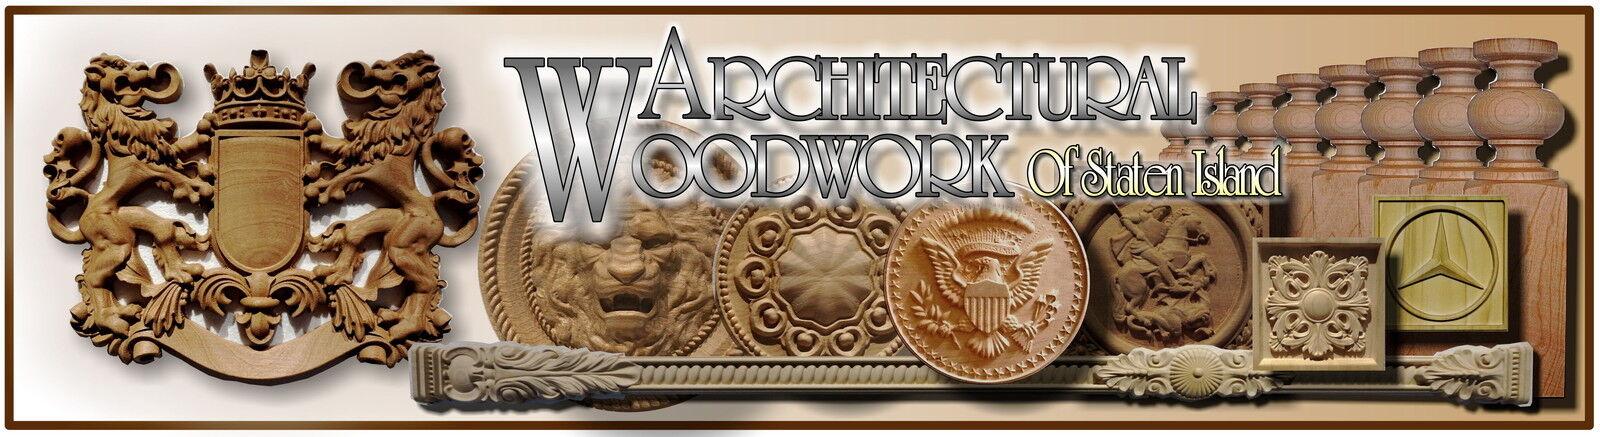 siwoodwork